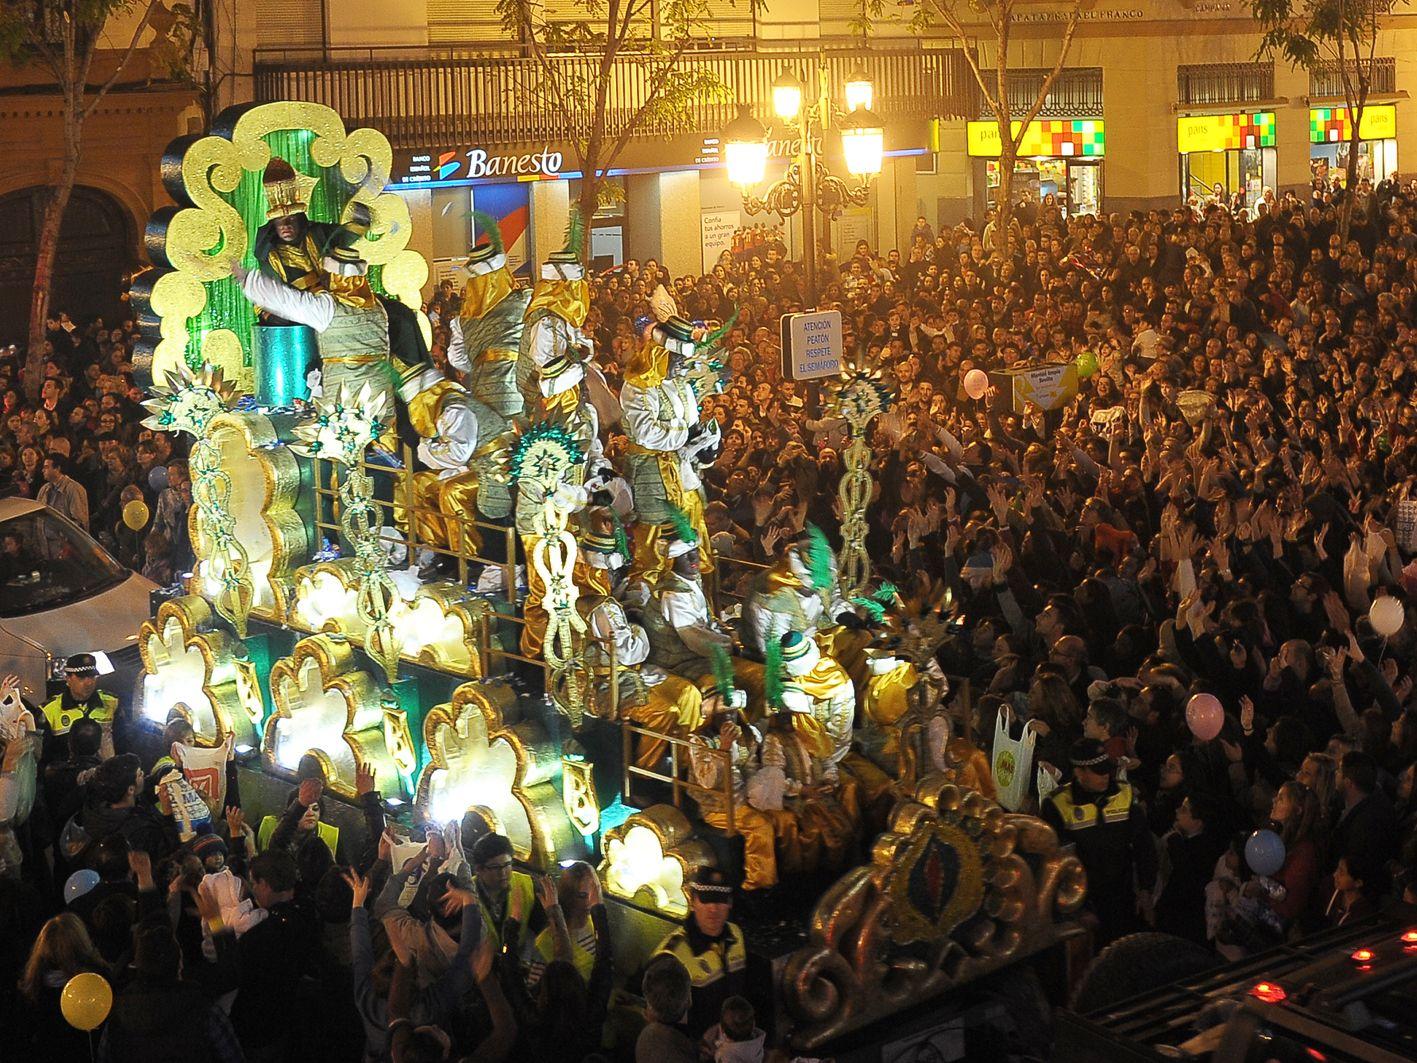 Cabalgata Fotos.File Cabalgata De Reyes Magos 2013 Jpg Wikimedia Commons